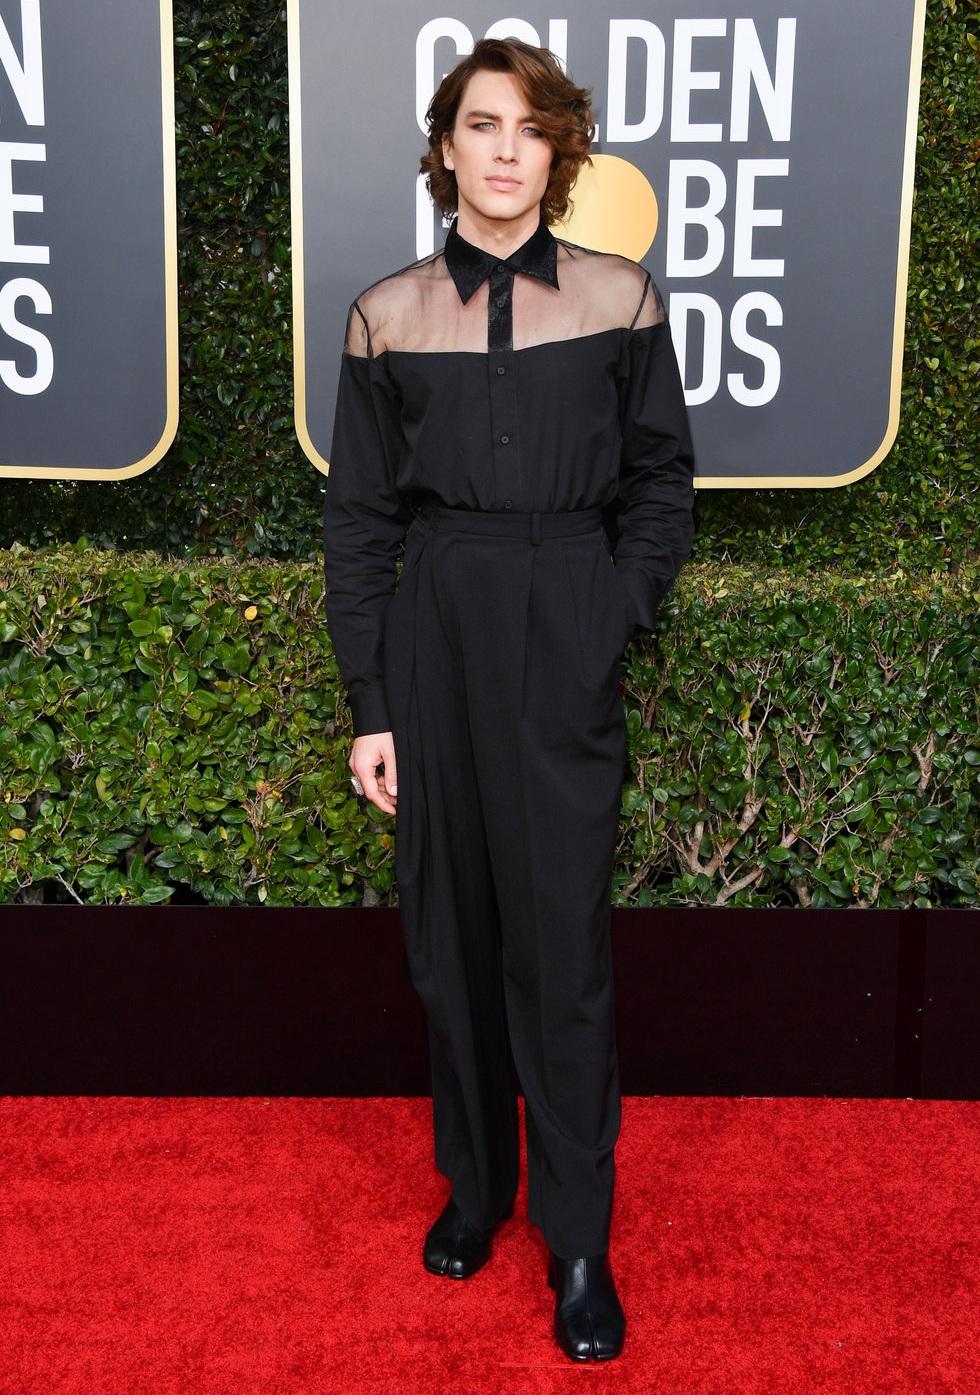 Cody Fern attends the 76th Golden Globe Awards